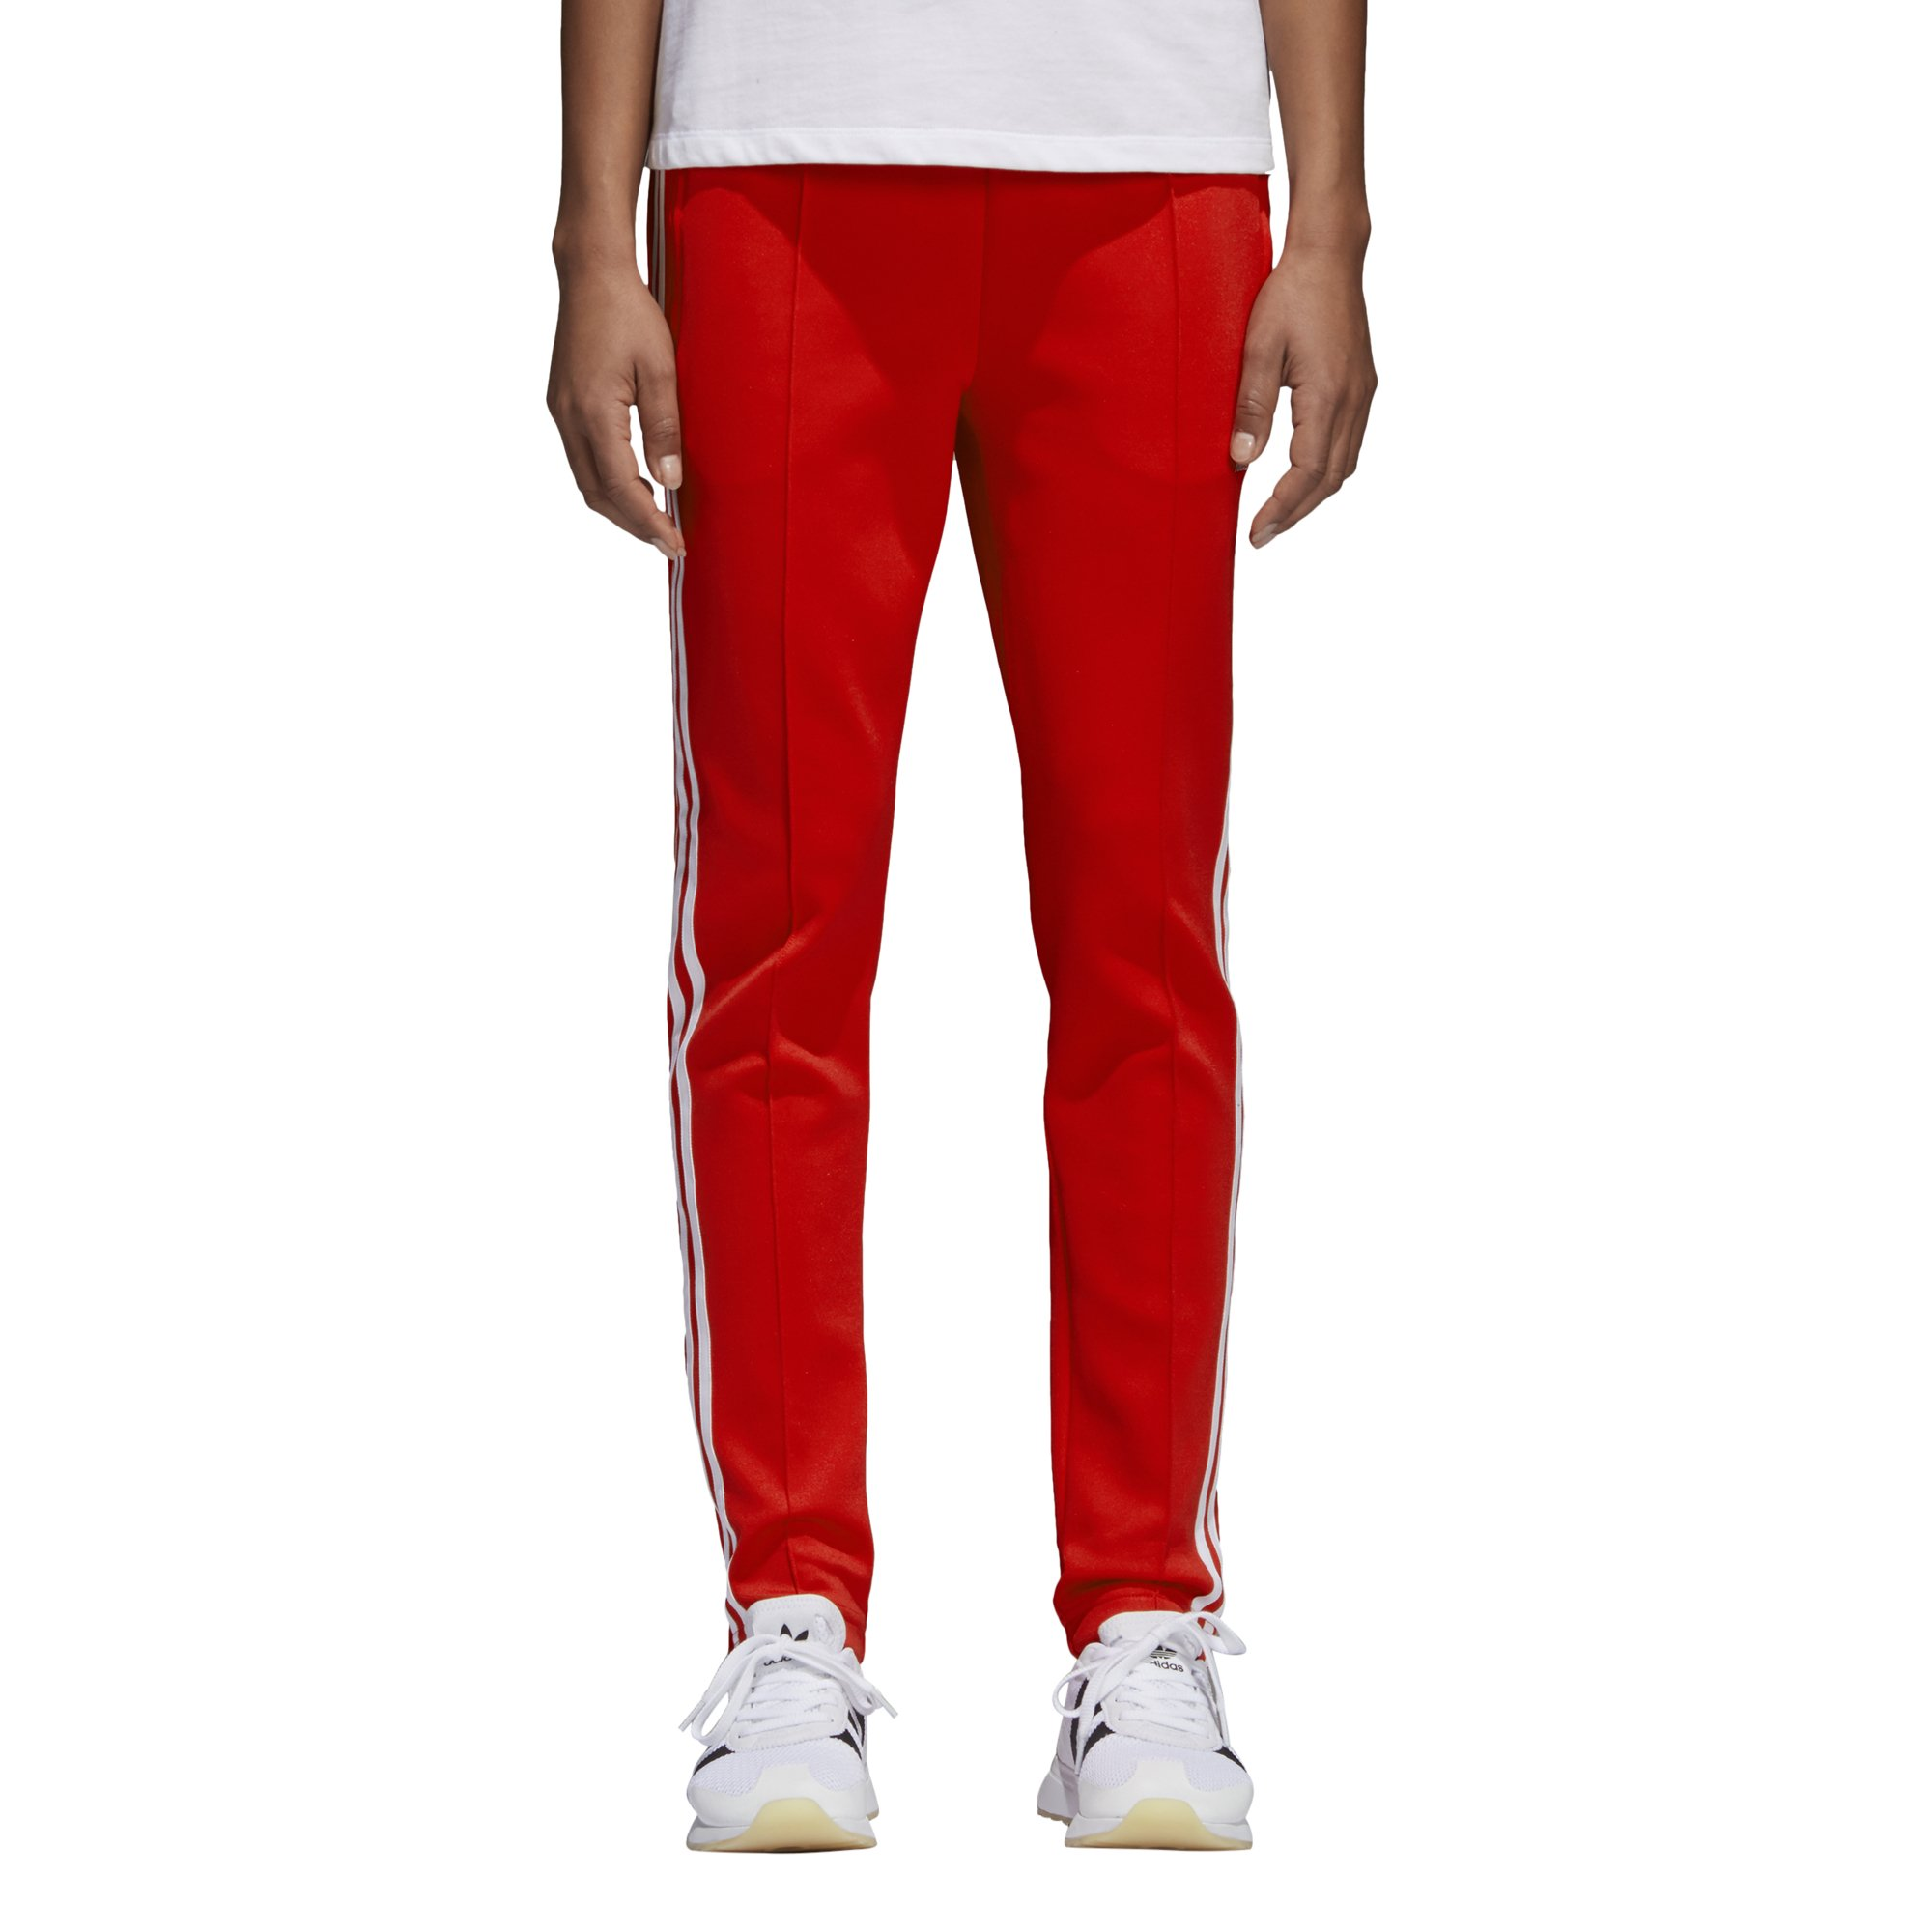 adidas Originals Women's Superstar Trackpant, Radiant Red, L